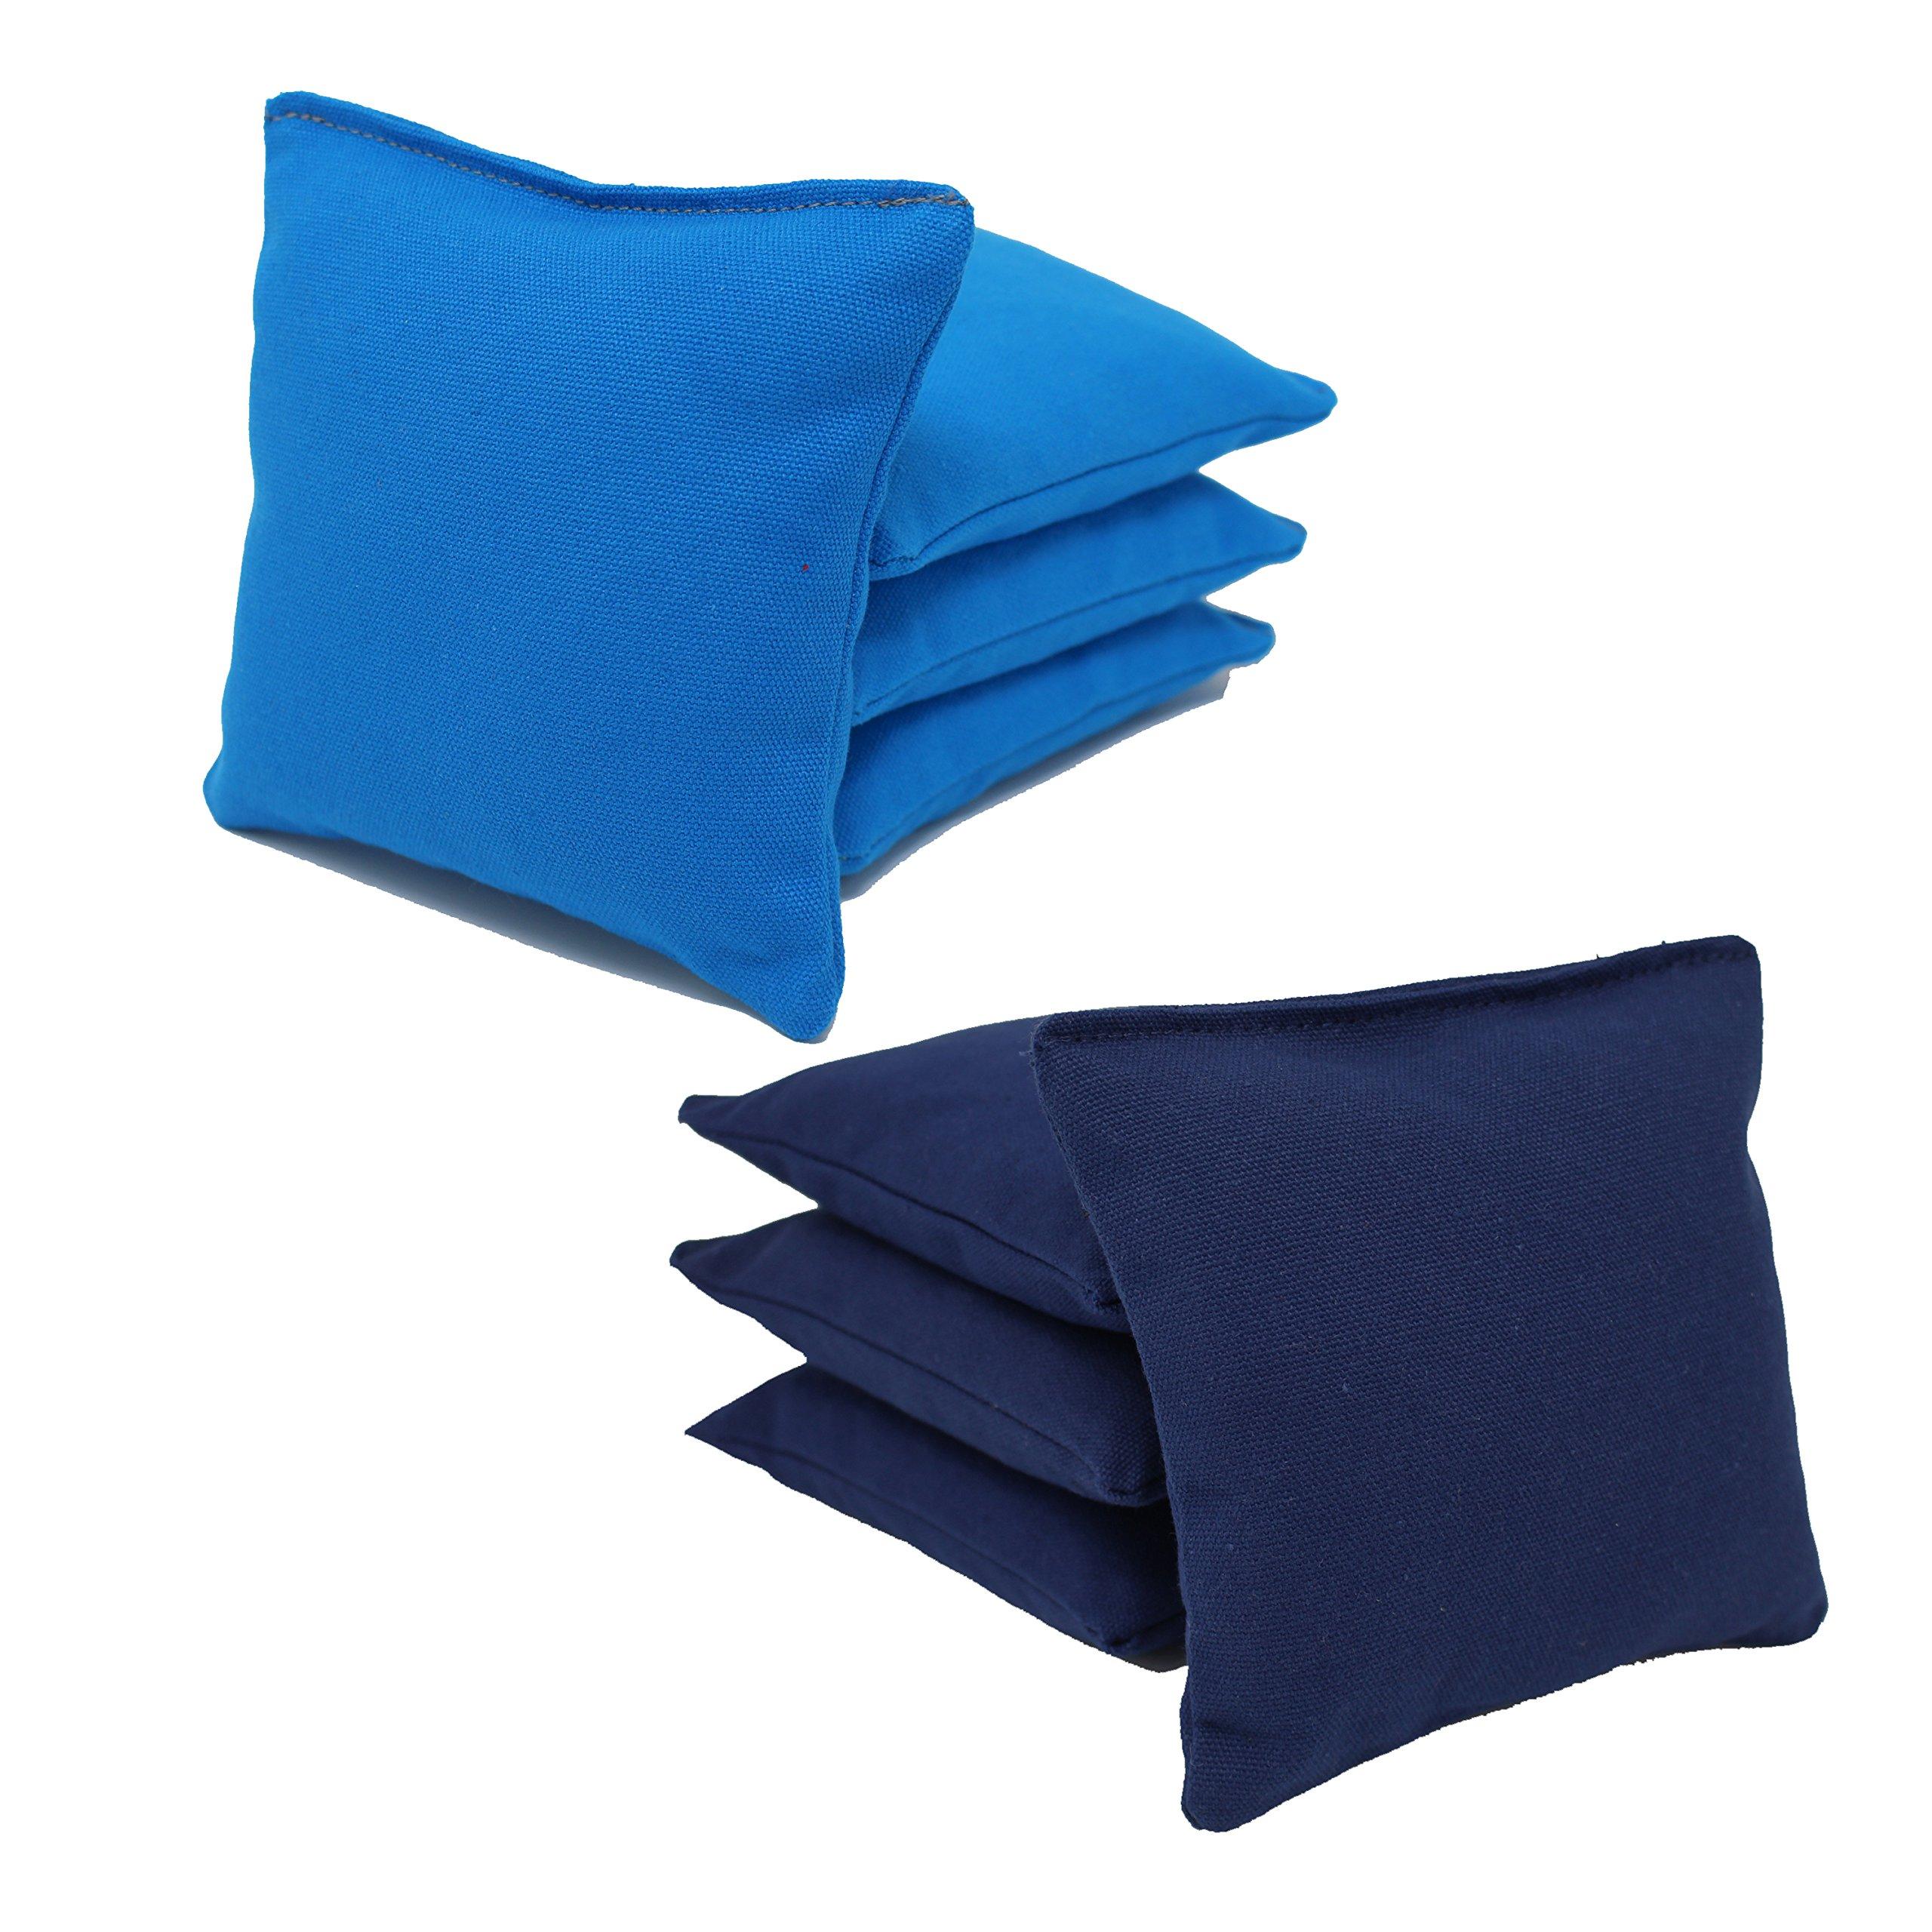 Free Donkey Sports Cornhole Bags (Pack of 8), Navy/Turquoise, Regular by Free Donkey Sports